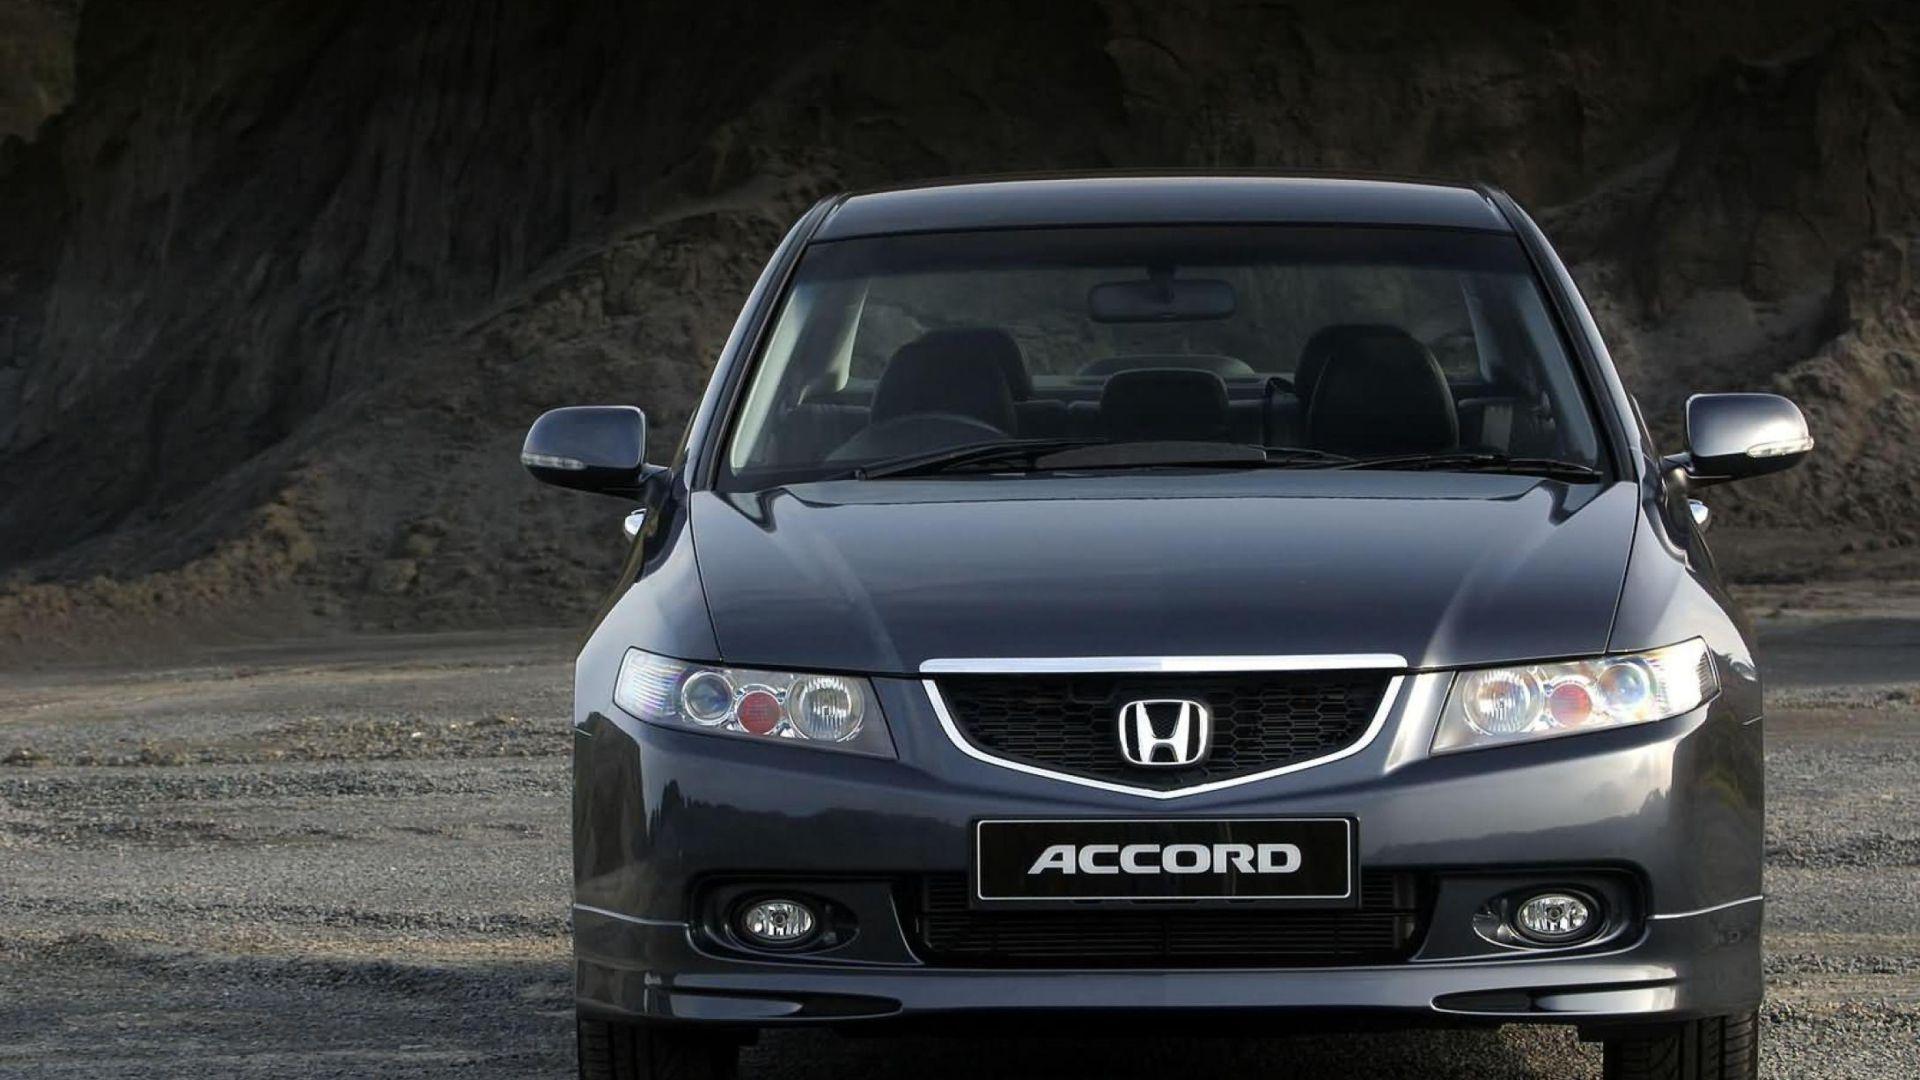 Honda Accord hd